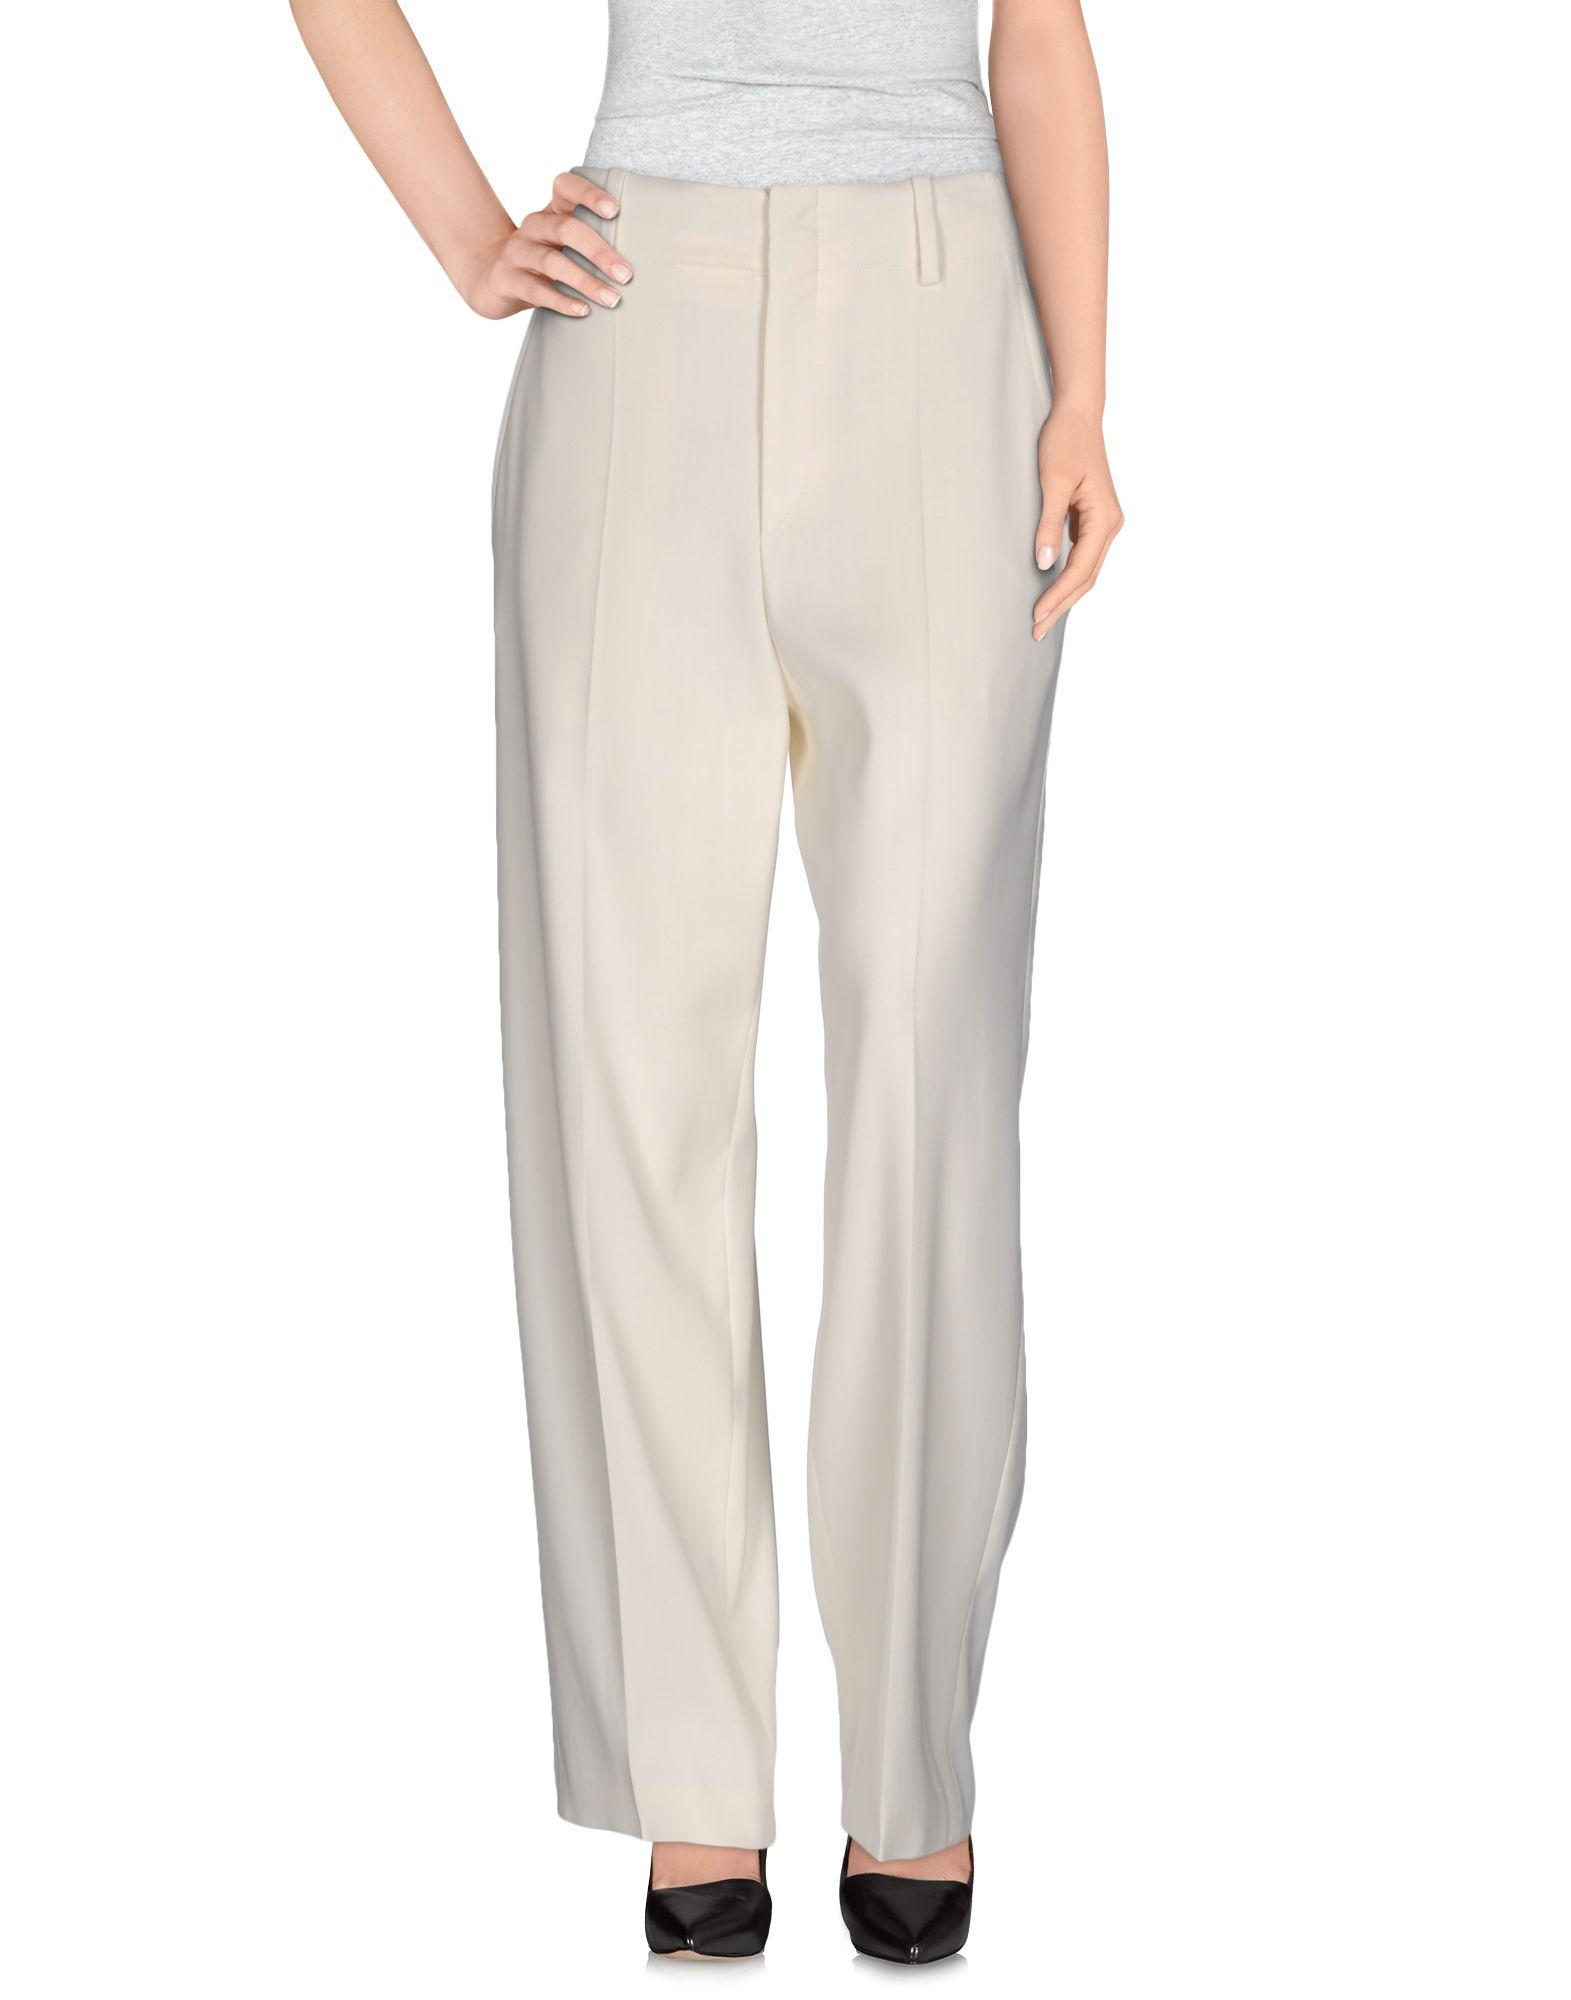 Pantalone Isabel Marant Donna - Acquista online su AxlygU